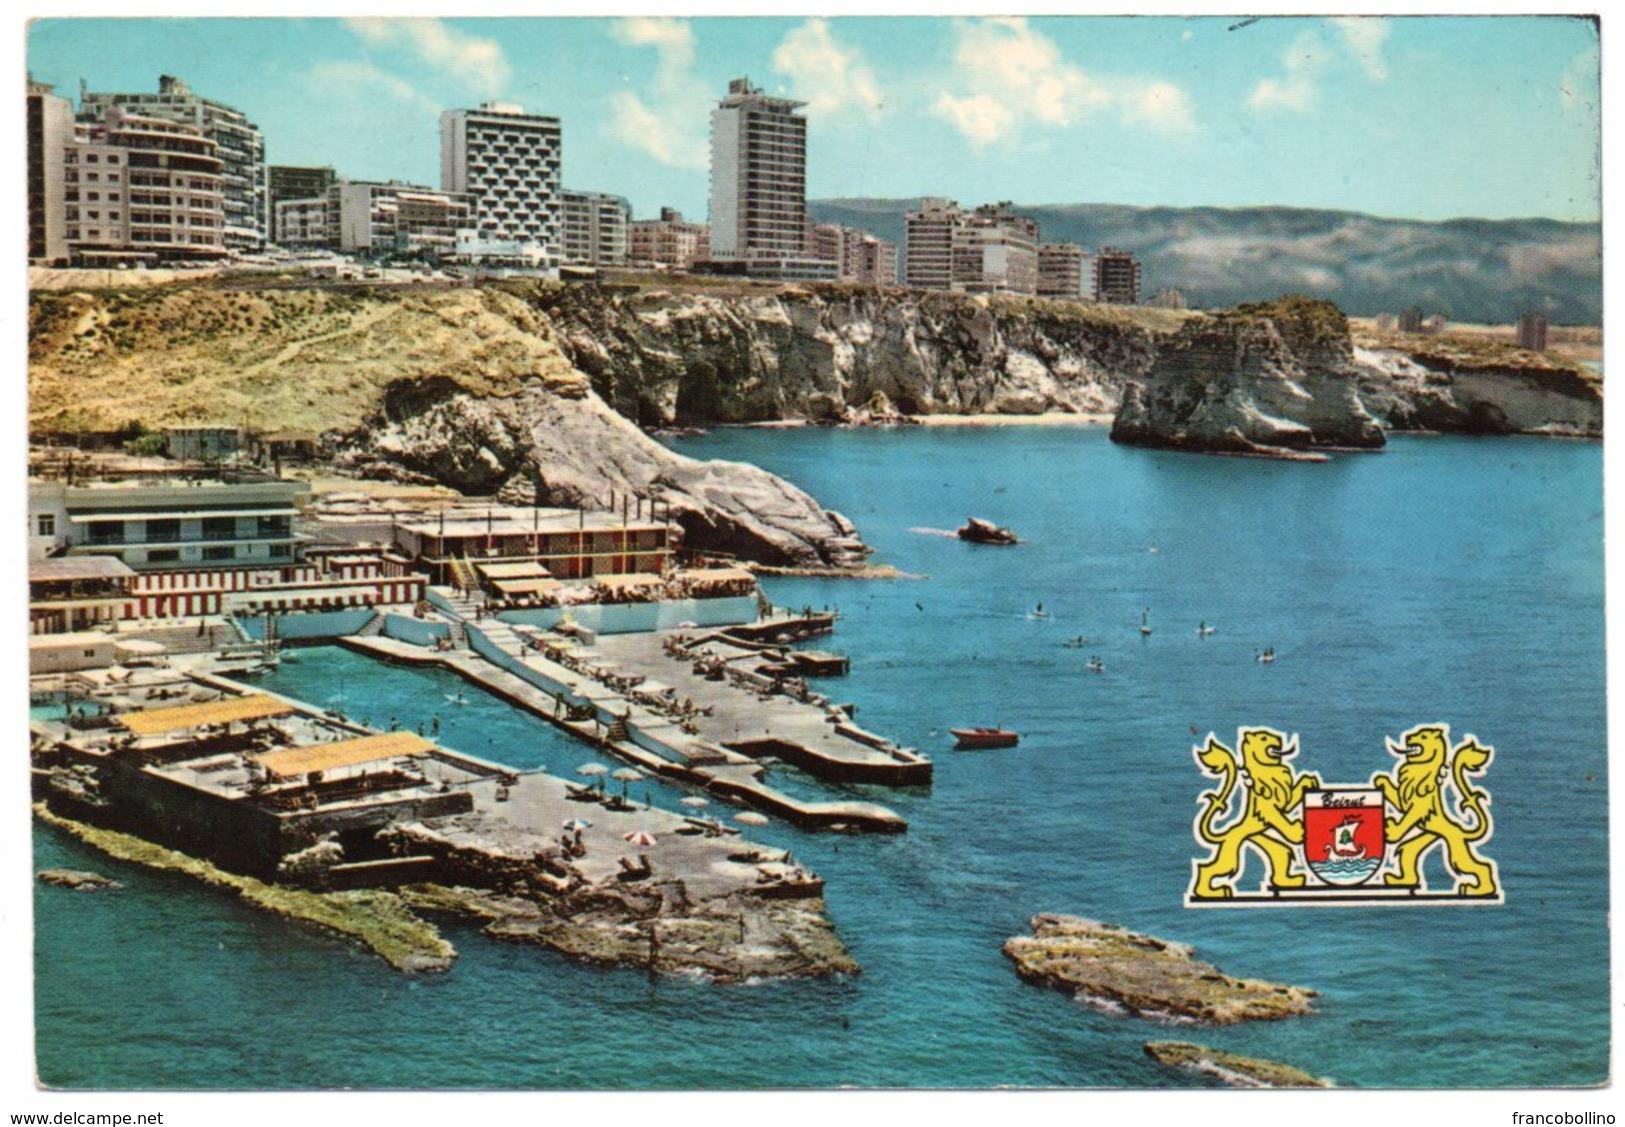 LIBAN/LEBANON - BEYROUTH MODERNE / MODERN BEIRUT - THE NEW RAOUCHE QUARTER AND THE PIGEONS ROCKS - Libano